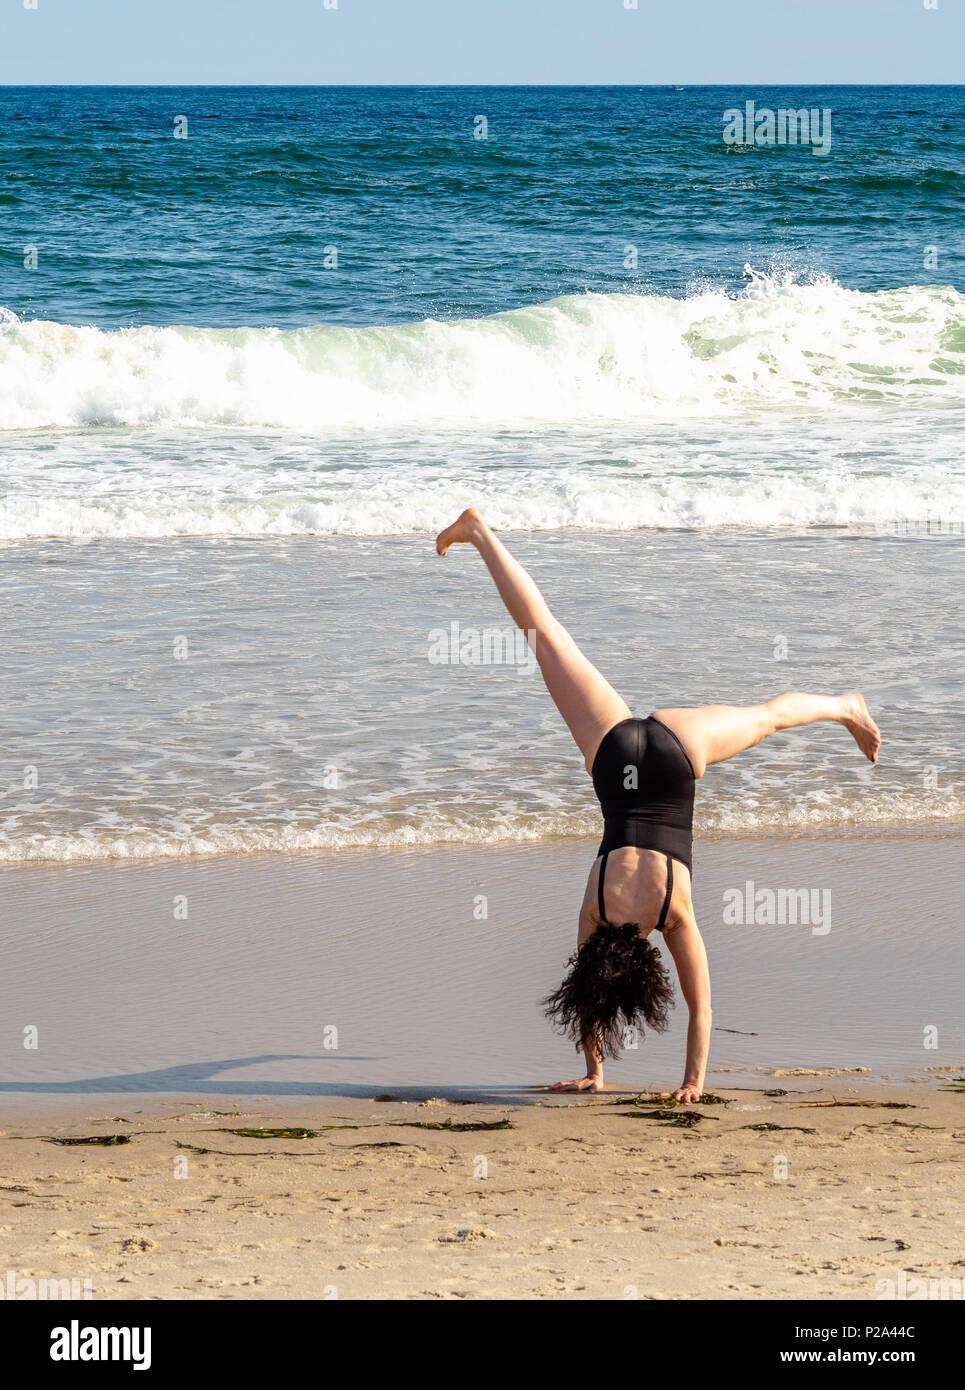 Woman doing cartwheel on beach. - Stock Image